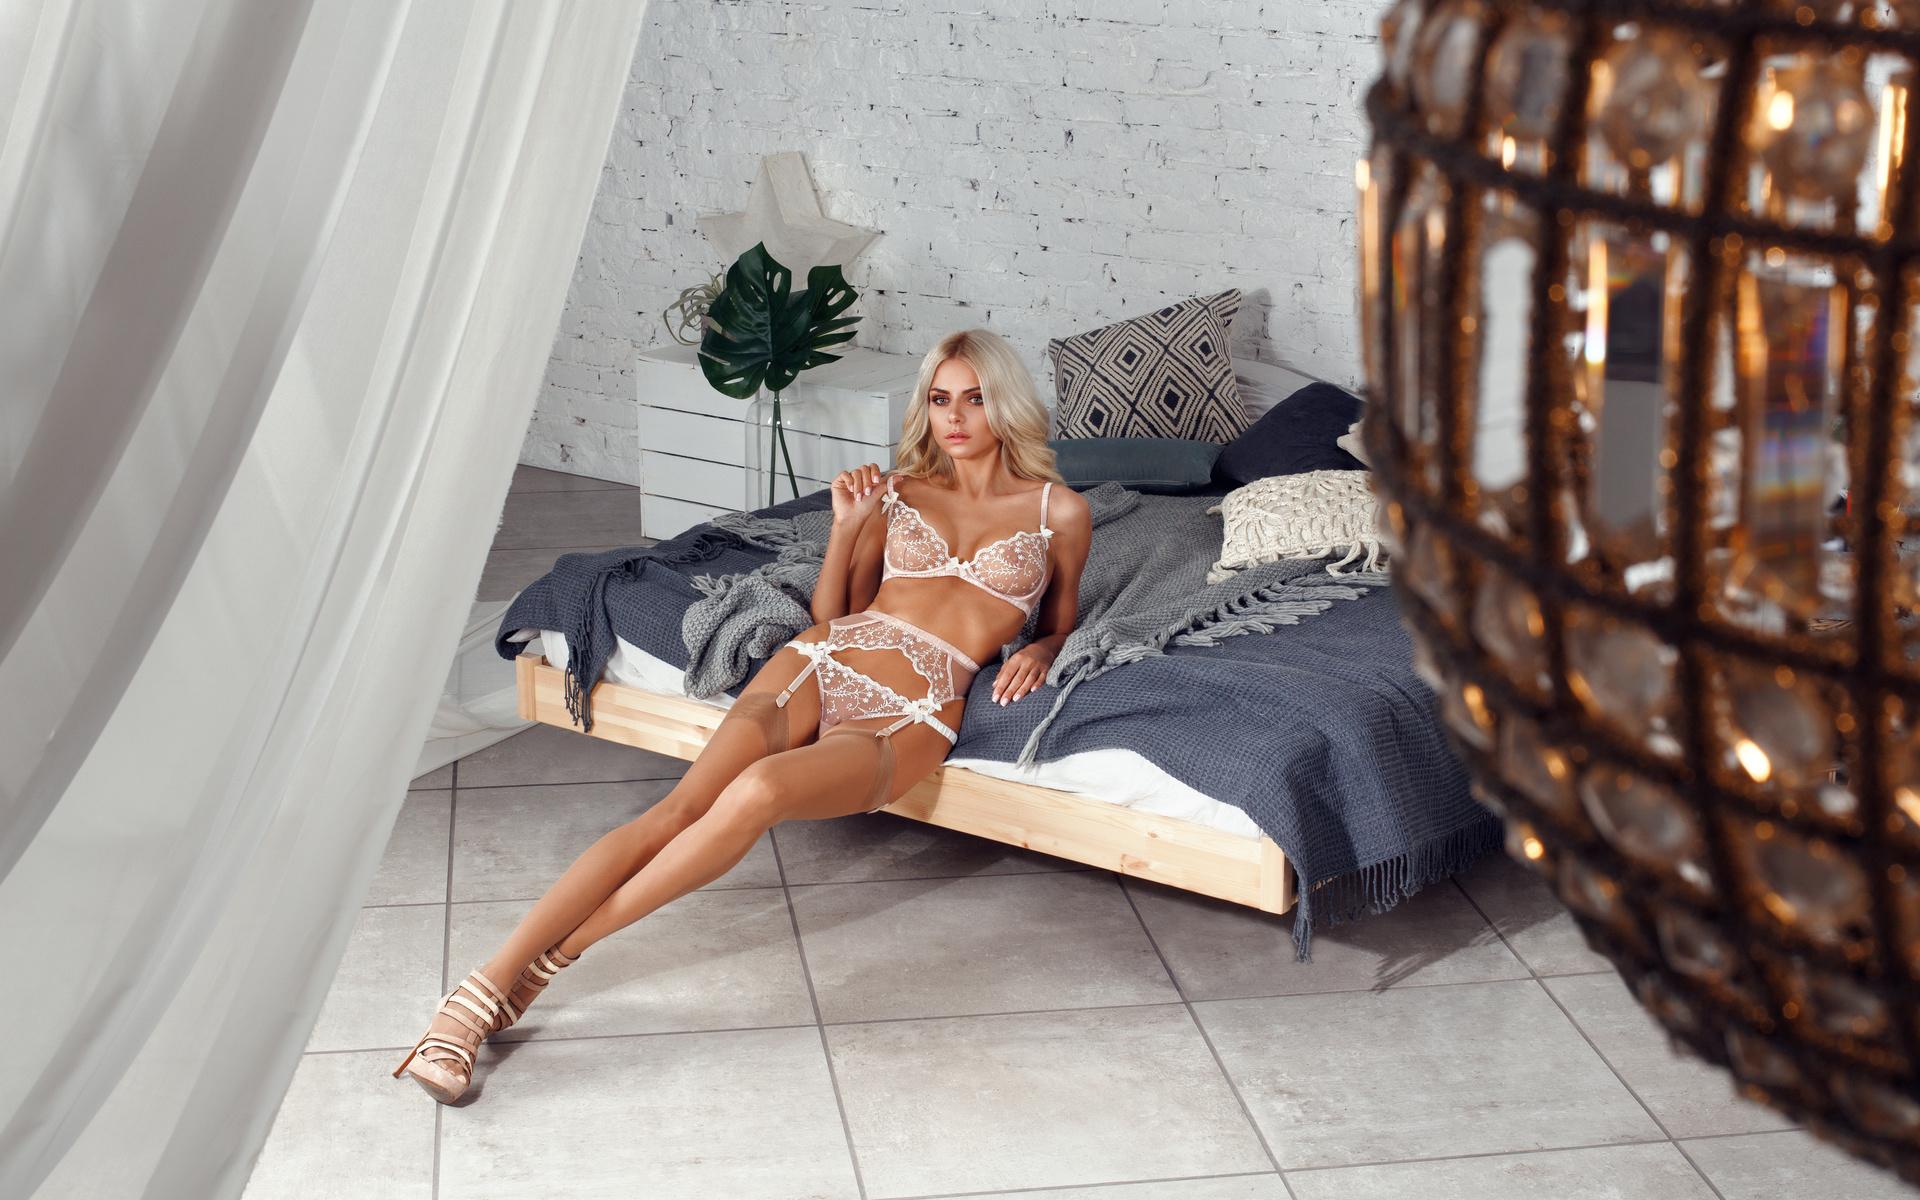 liza svistunova, девушка, блондинка, белое бельё, кровать, подушки, стена, кирпич